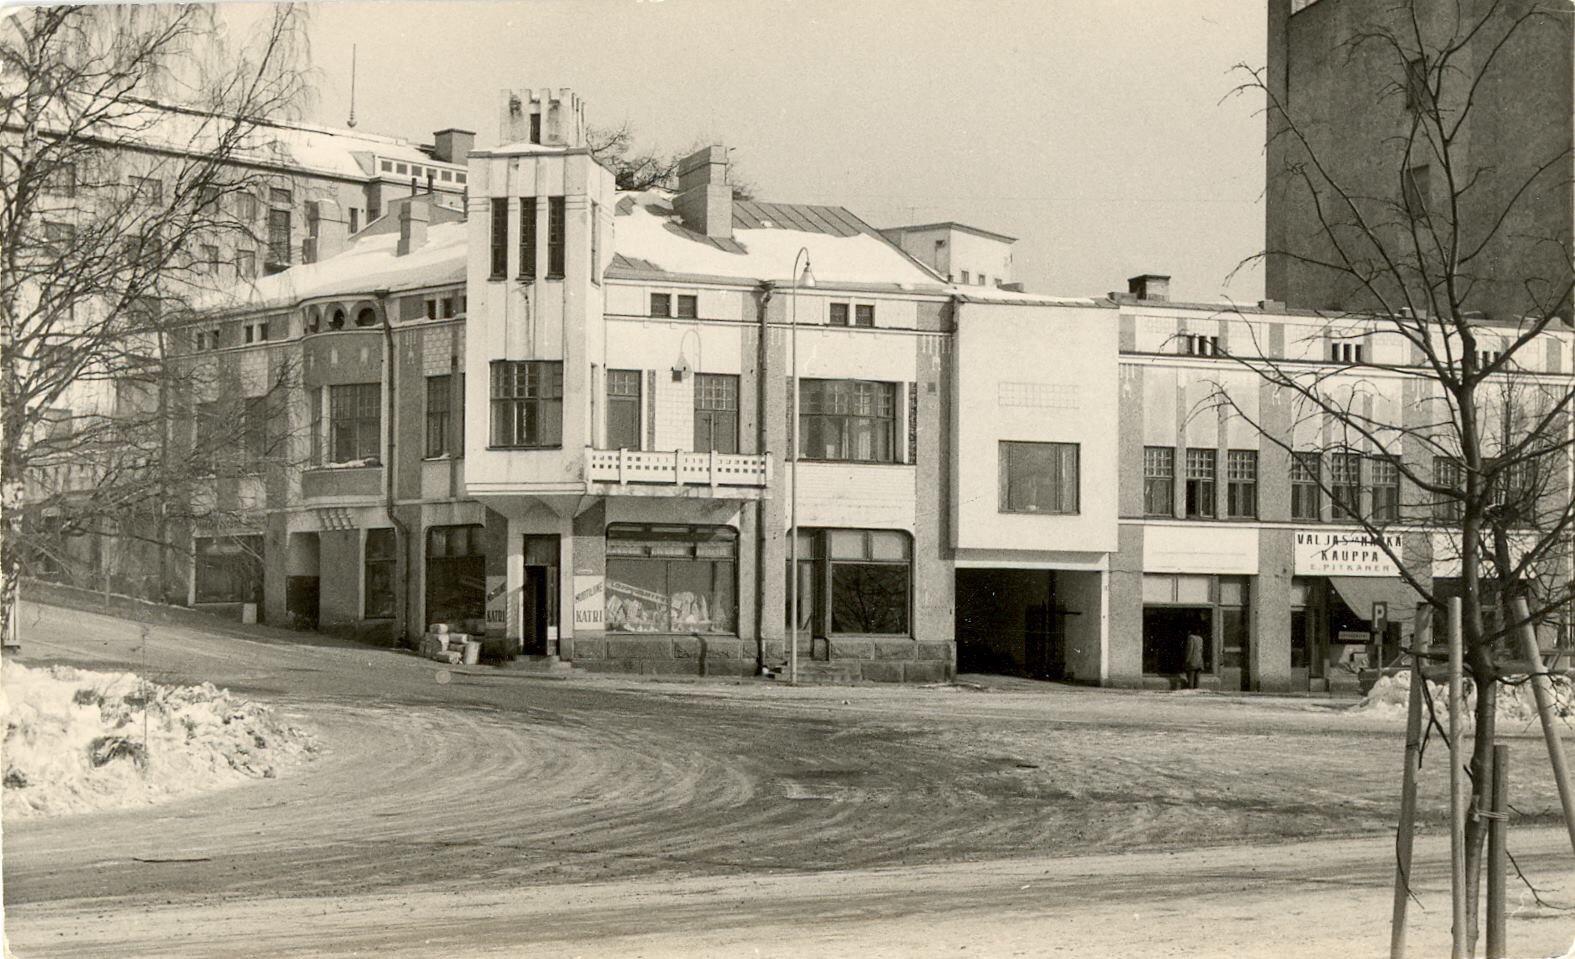 Lauri Korhosen suunnittelema Satamakatu 5 oli kaupungin komein  jugend-rakennus 3fad7d908b